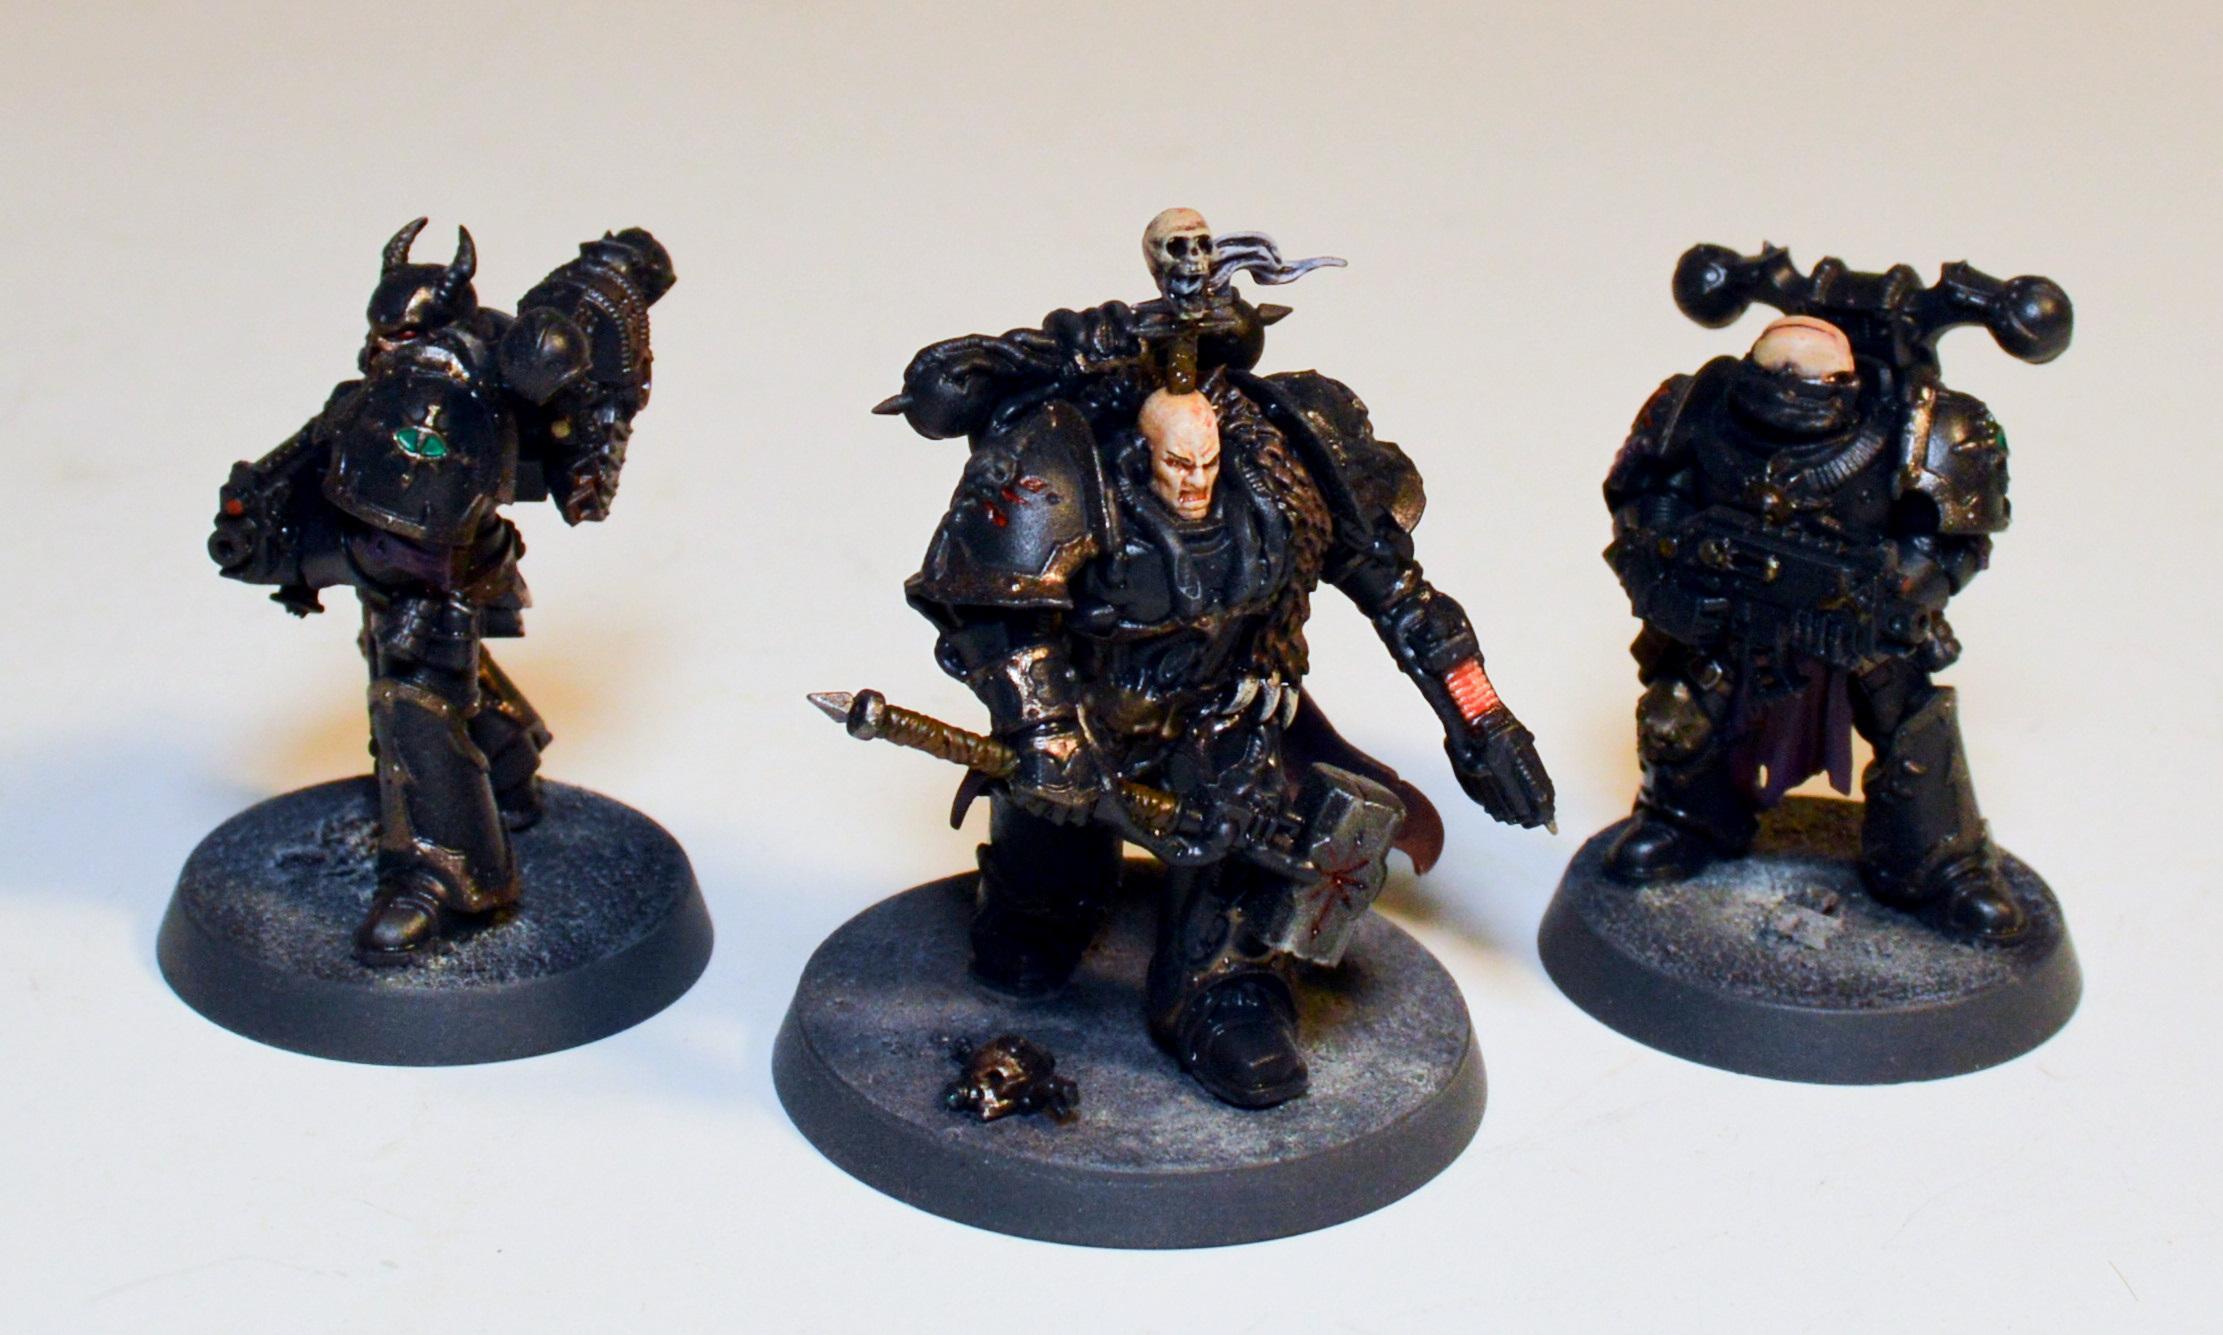 Blackstone Fortress, Chaos, Chaos Lord